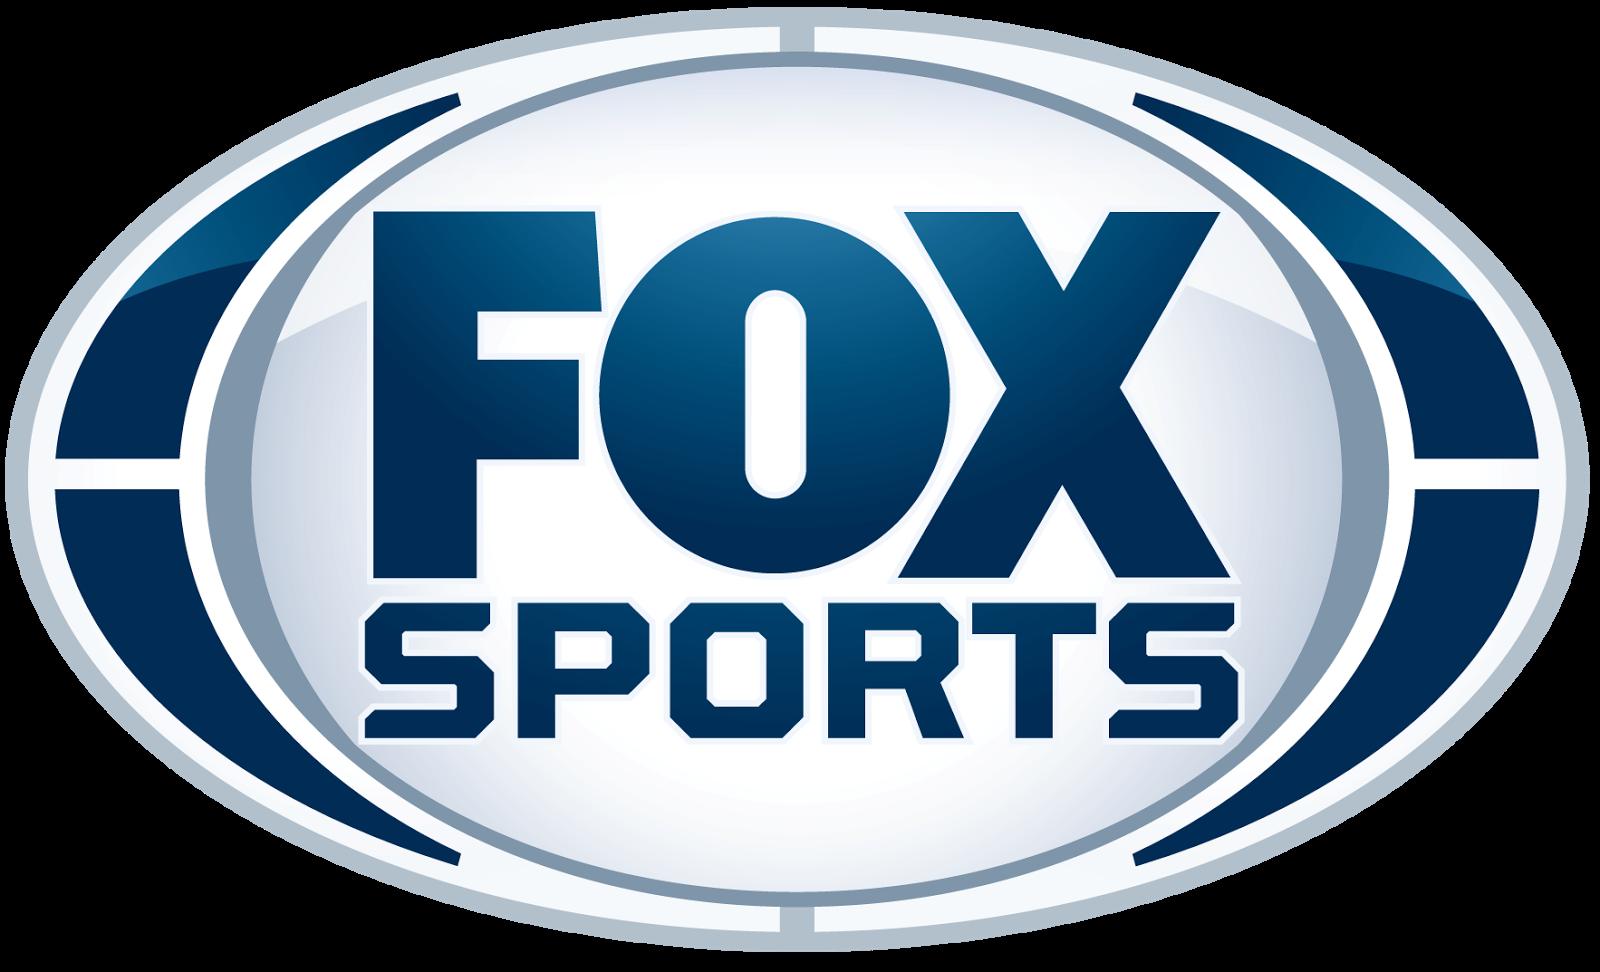 http://tuttosport.us/boxing